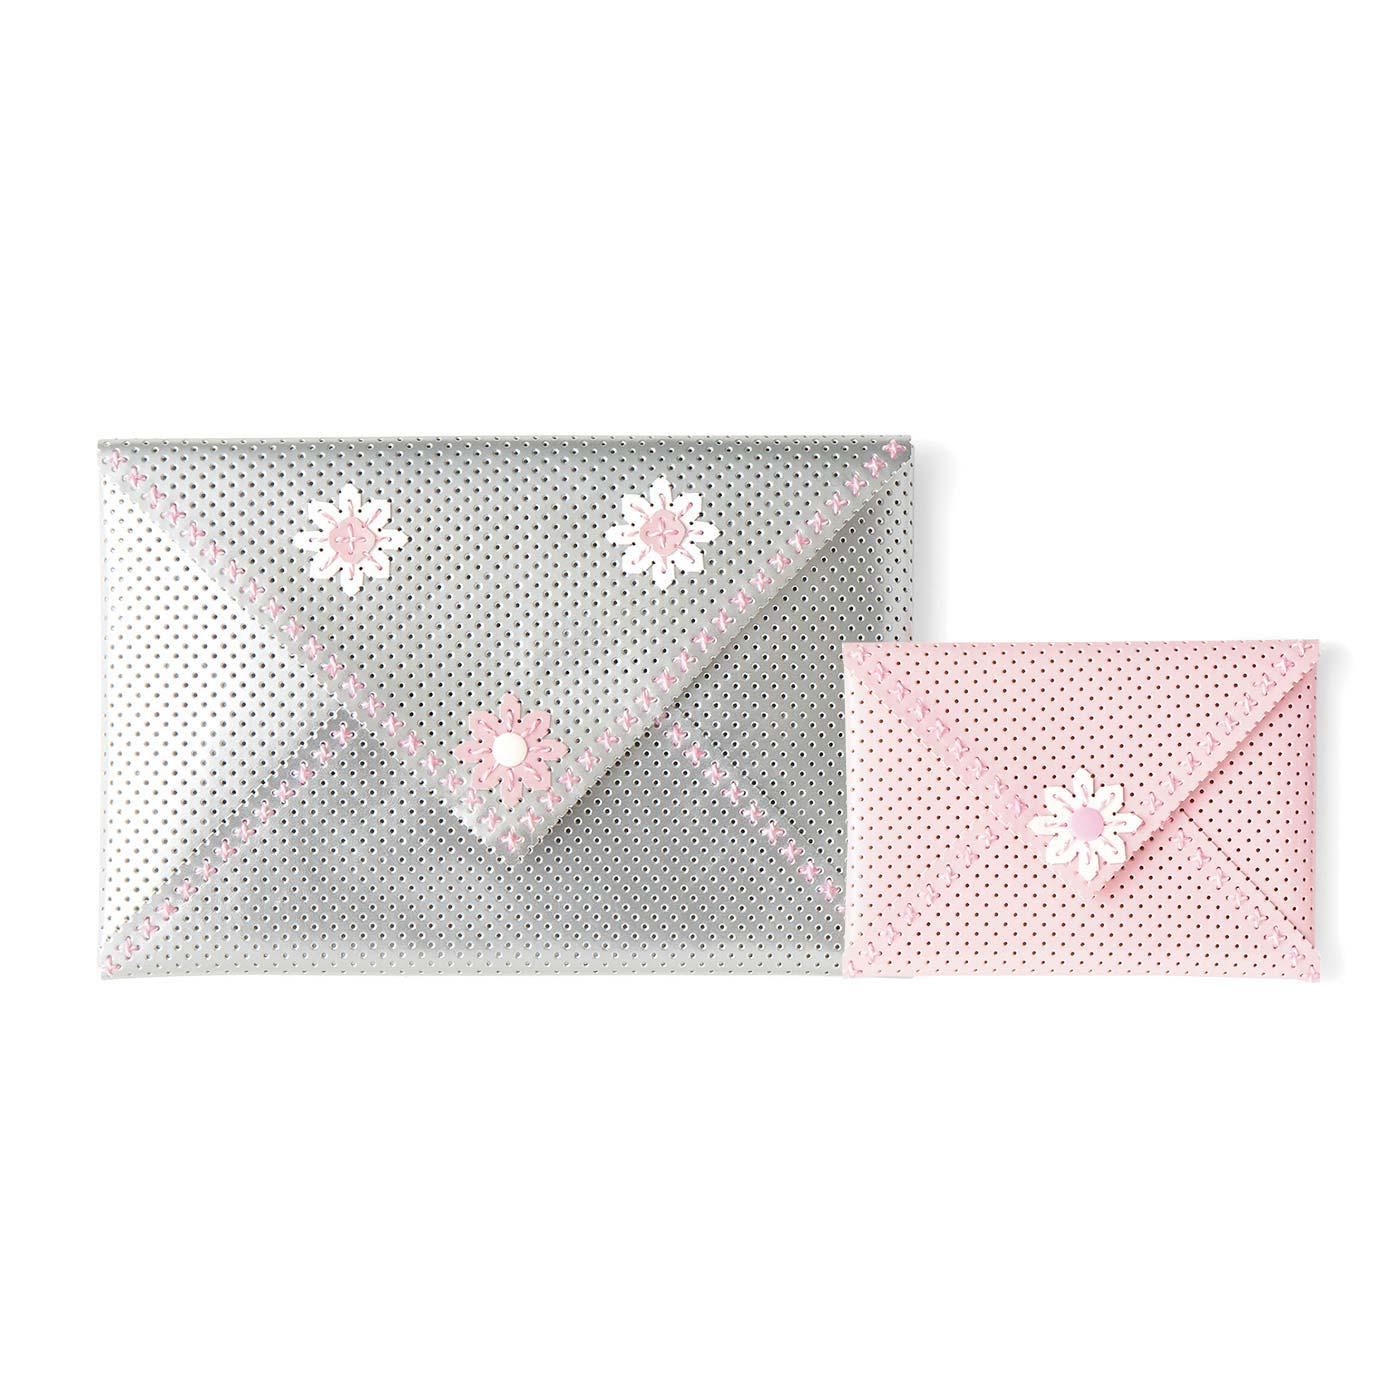 Enveloppes ? fleurs(アンヴロップ・ア・フルール)(封筒形ポーチセット) 大:縦約16cm、横約24cm 小:縦約10cm、横約14cm